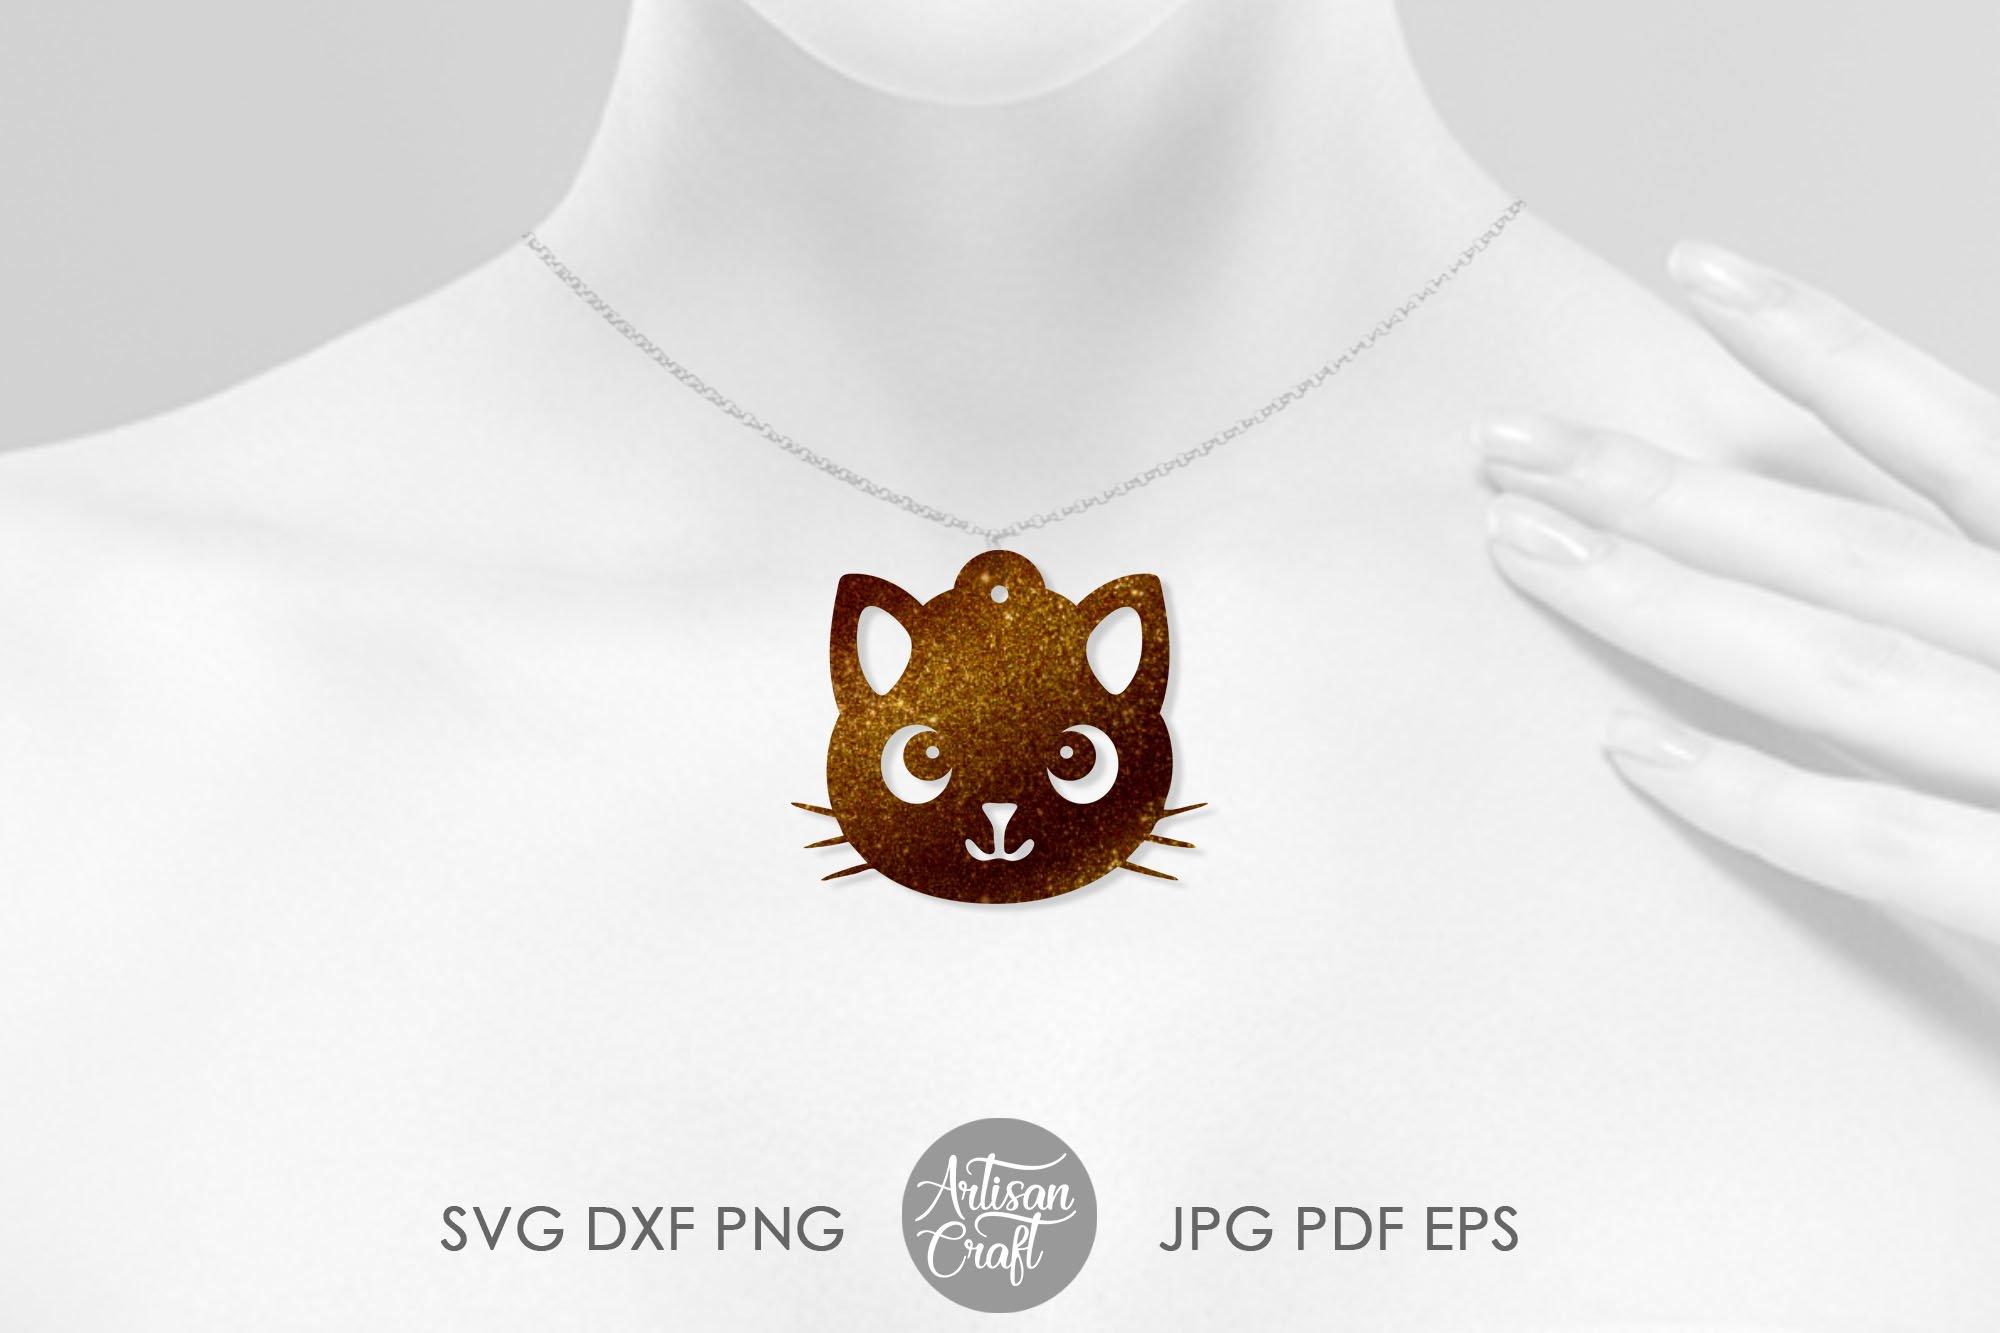 Cat earrings, svg, earrings for kids, cute cat earrings example image 6